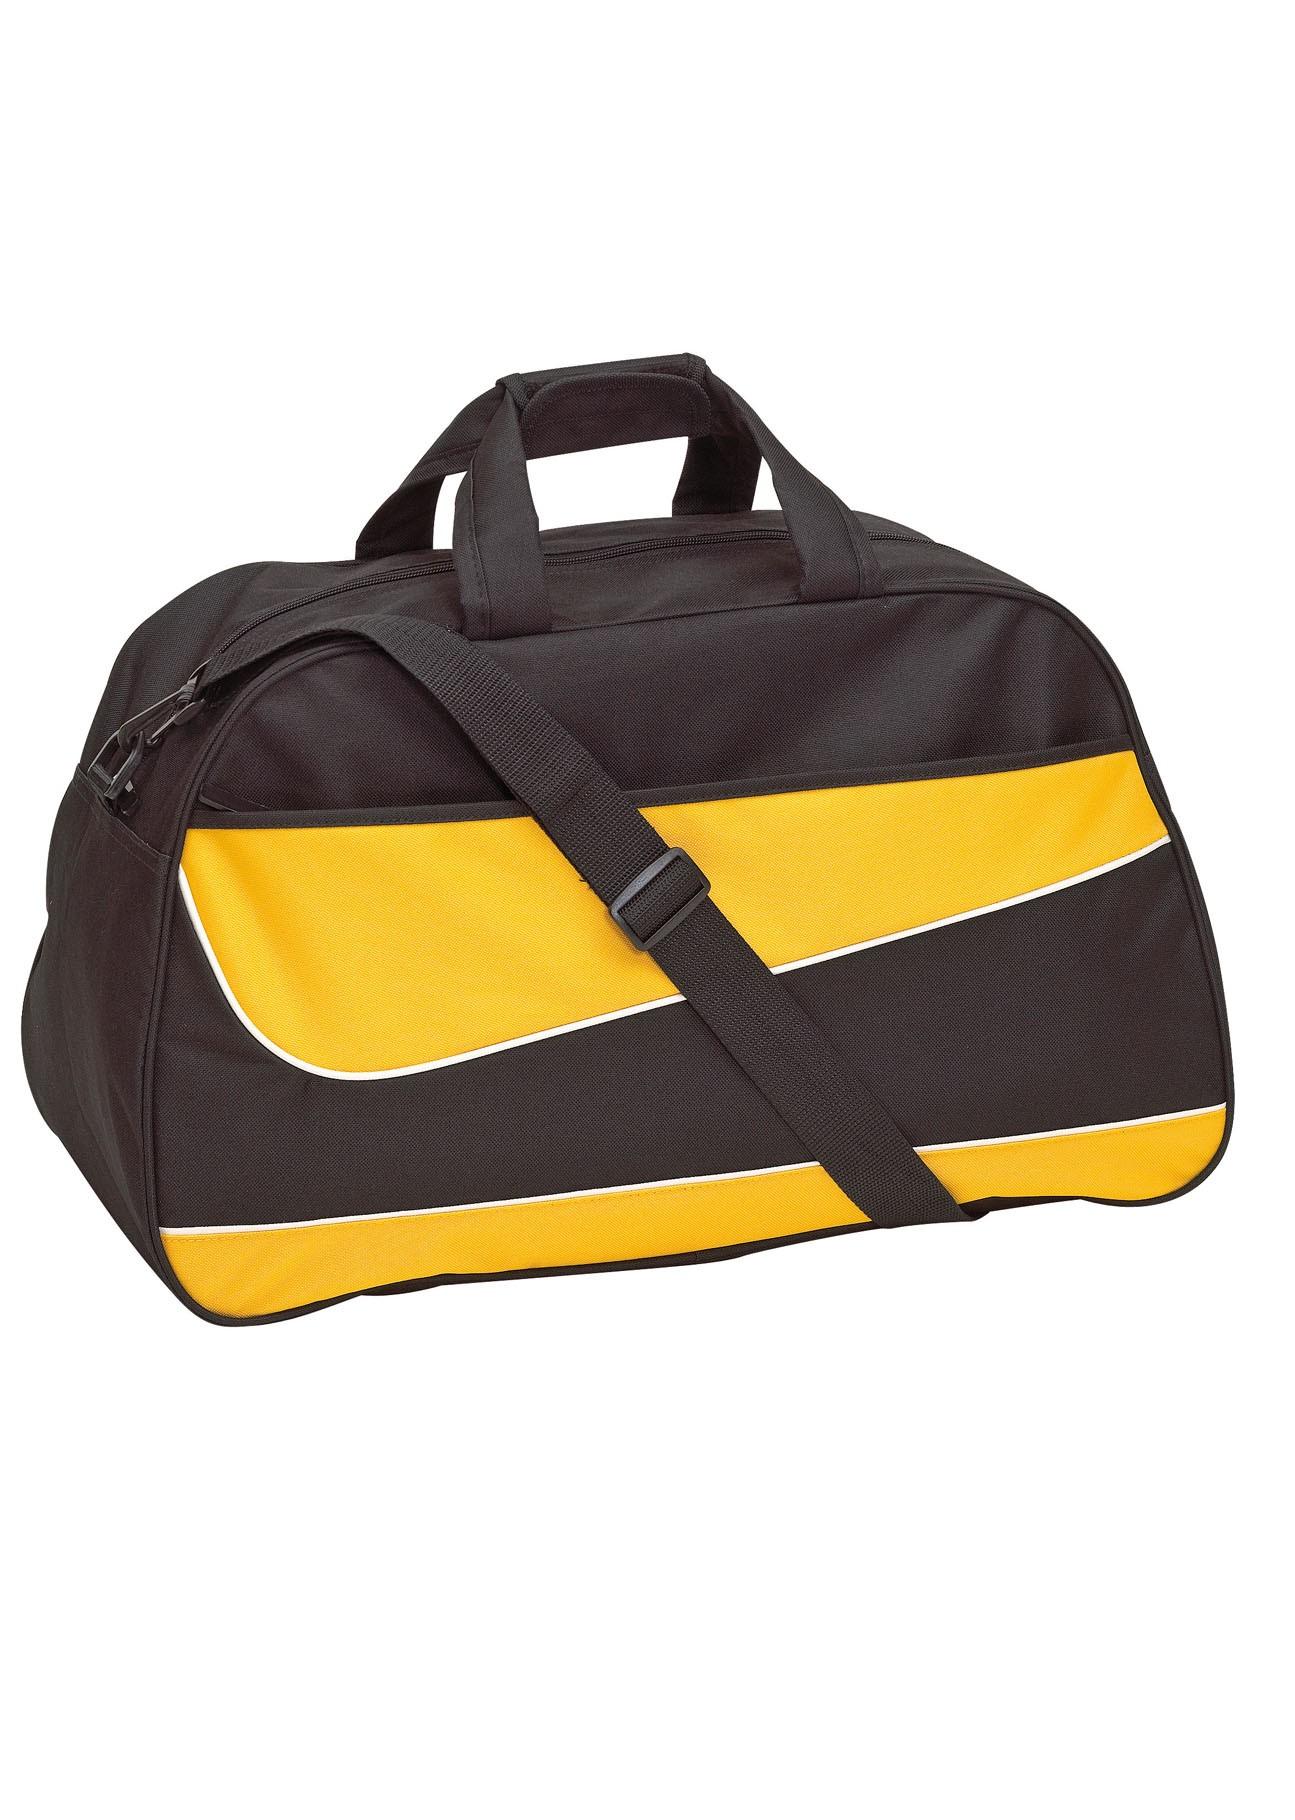 eee55a15cd24a 56-0808515 Sporttasche Pep schwarz gelb